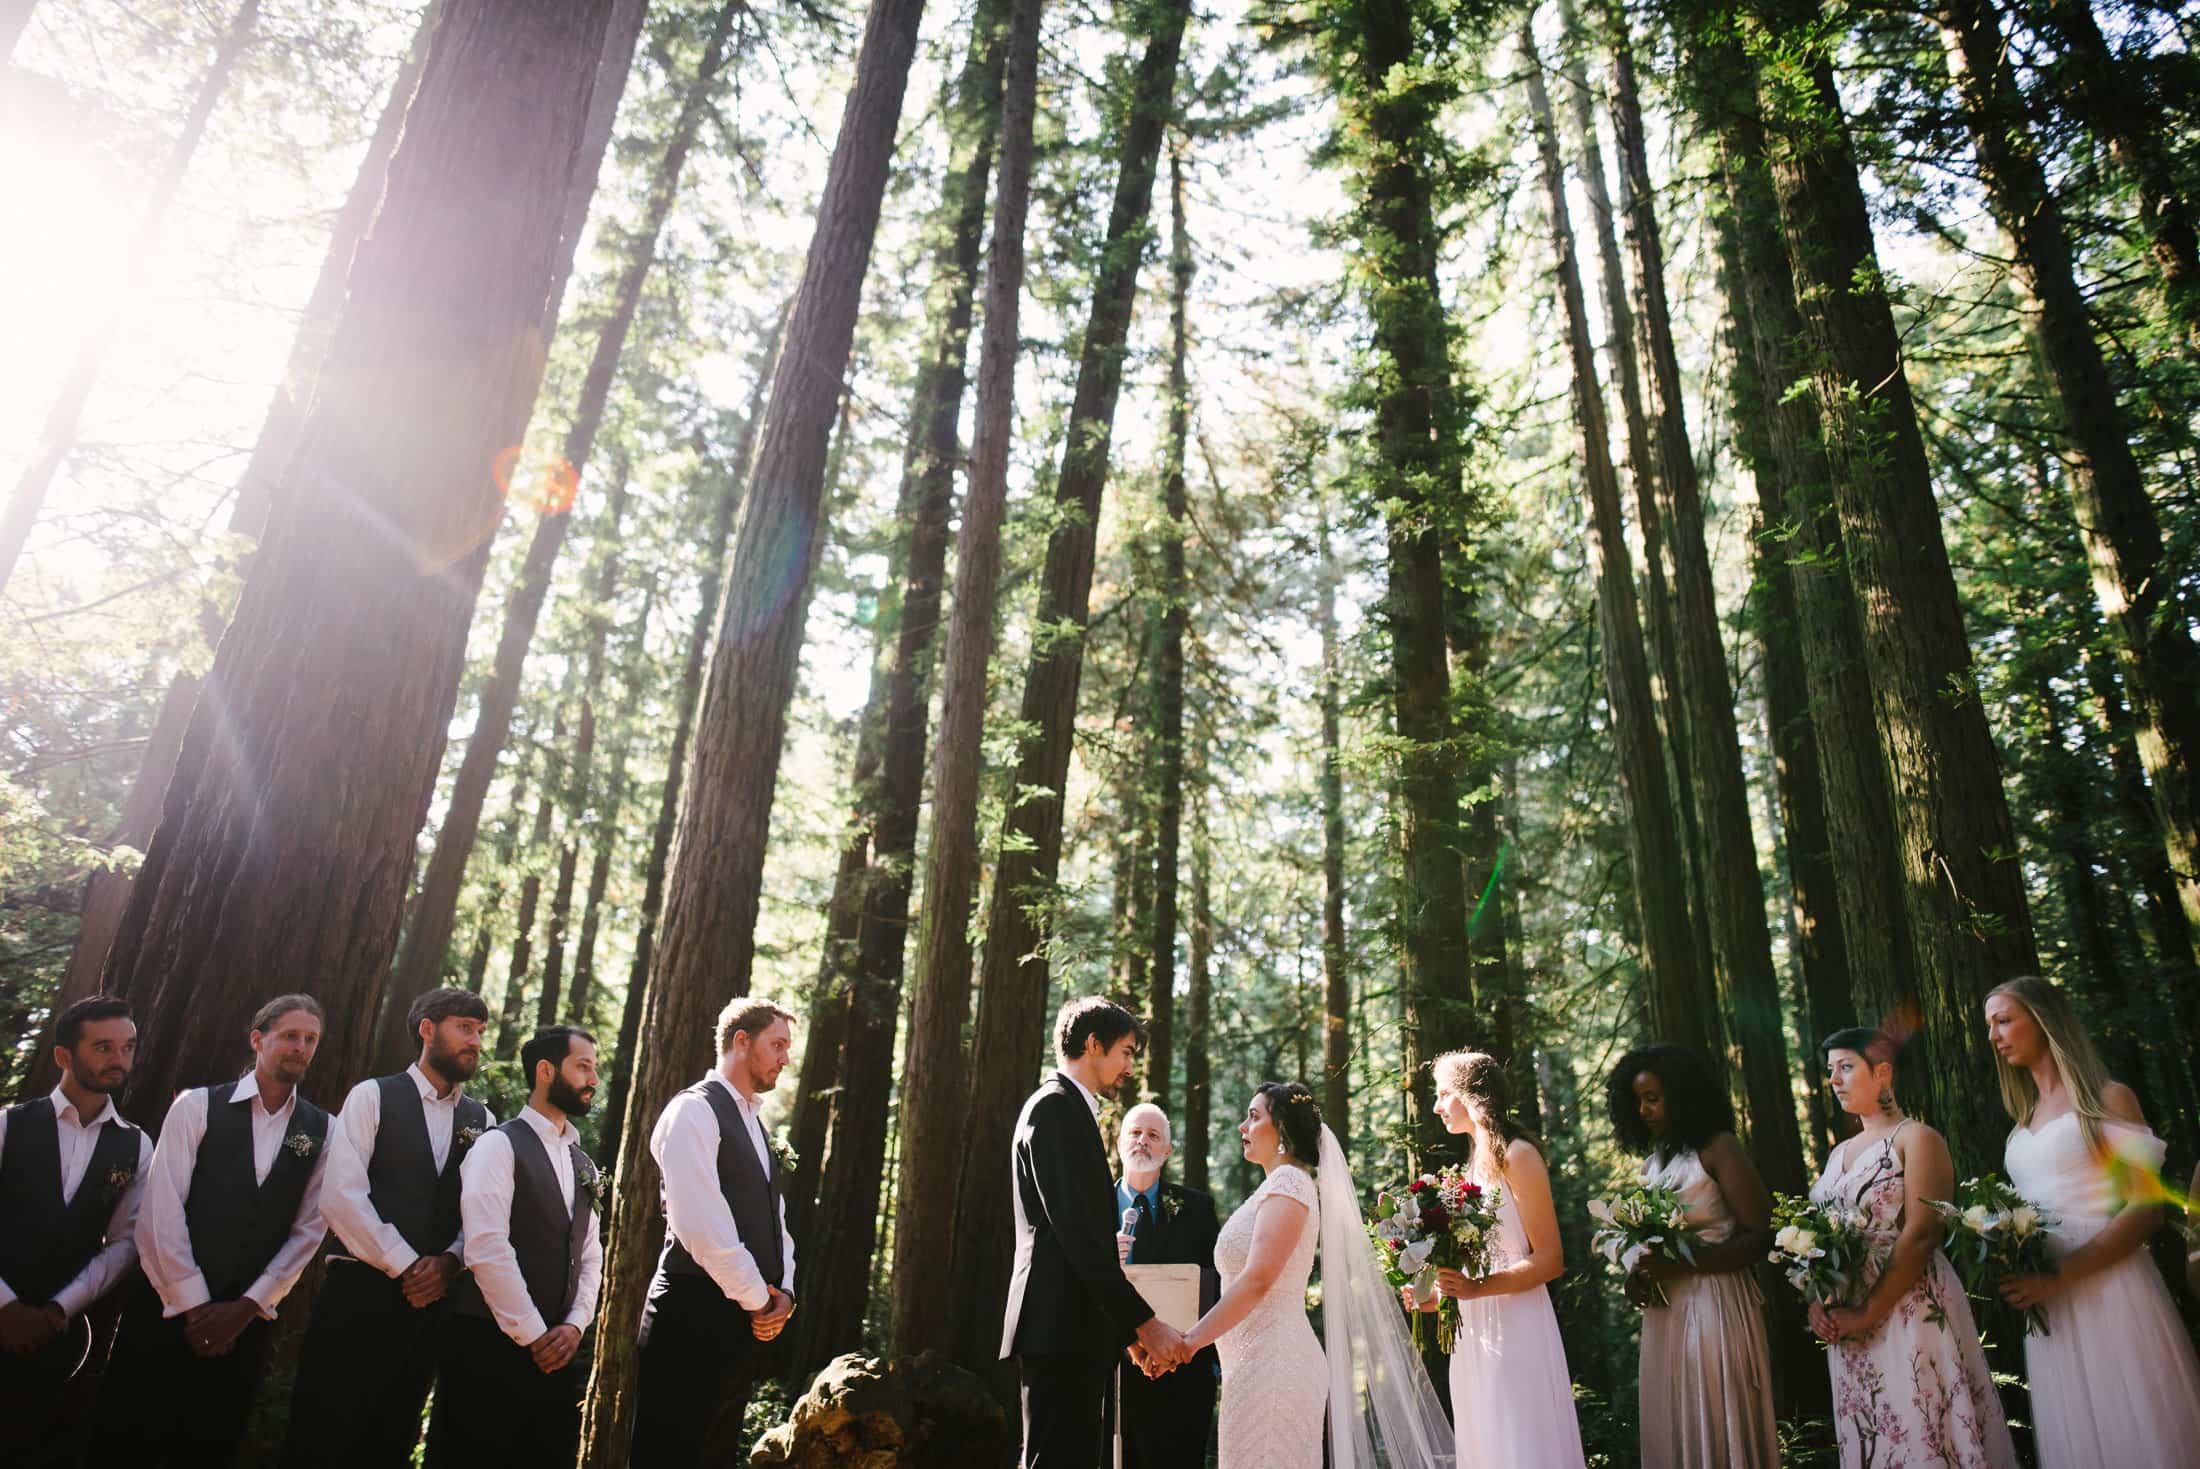 Robert's Regional Park wedding Bay Vista Site